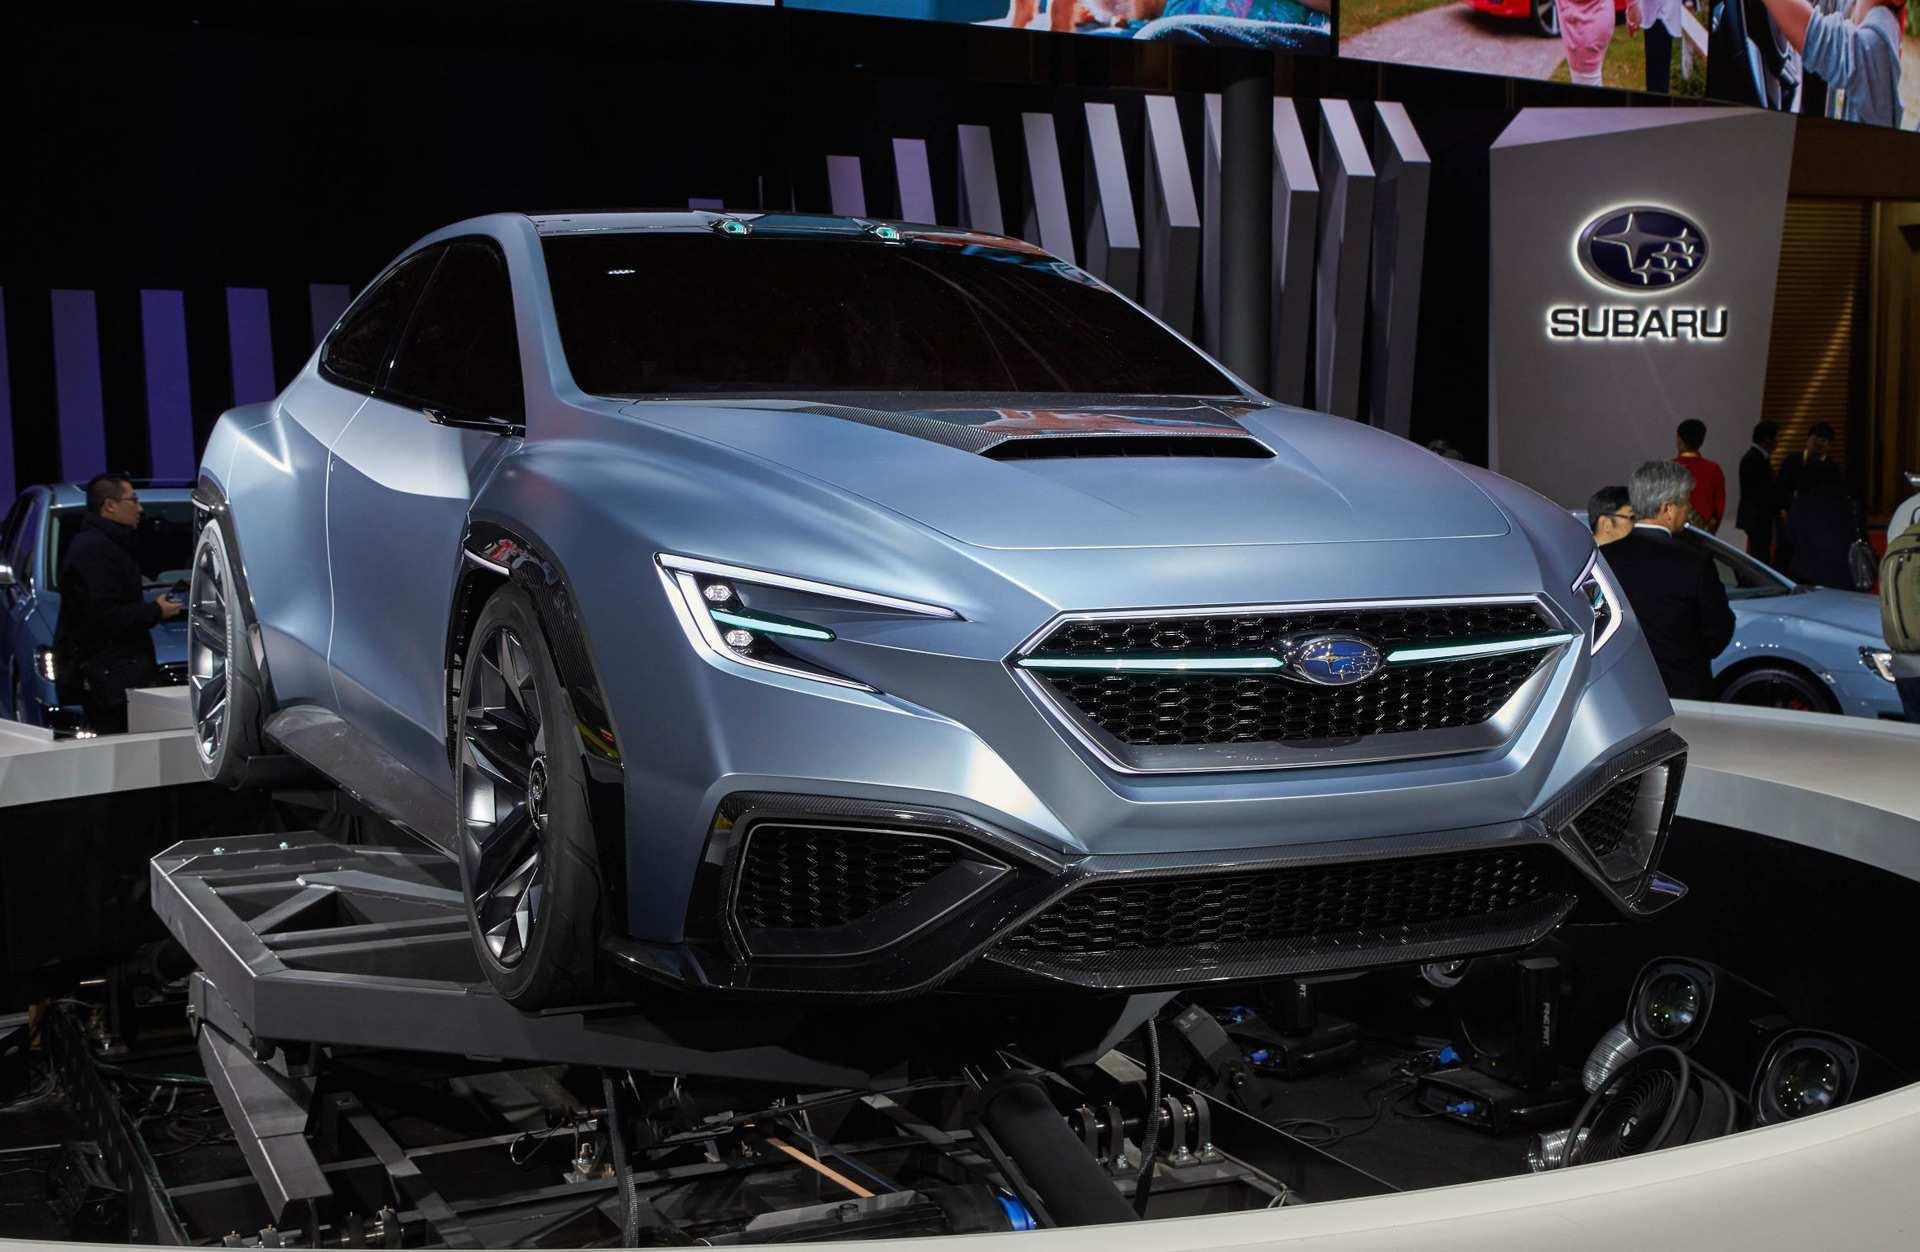 80 New Subaru Viziv 2020 Pictures by Subaru Viziv 2020